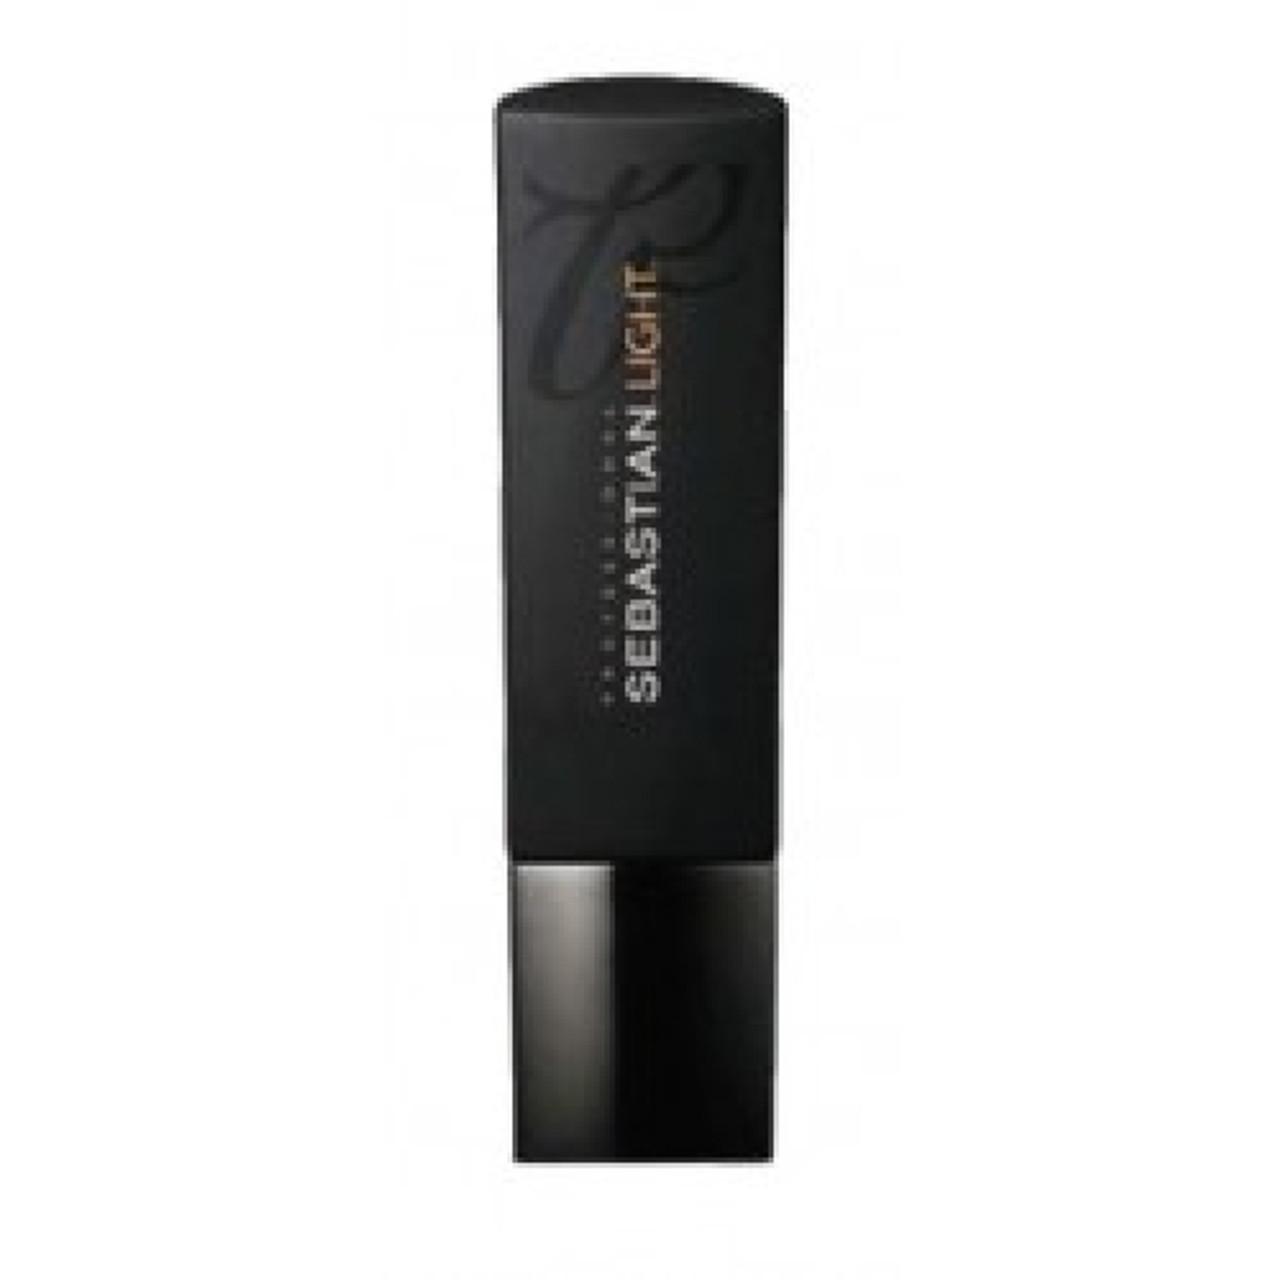 Sebastian Light Shine Shampoo - 8.4 oz